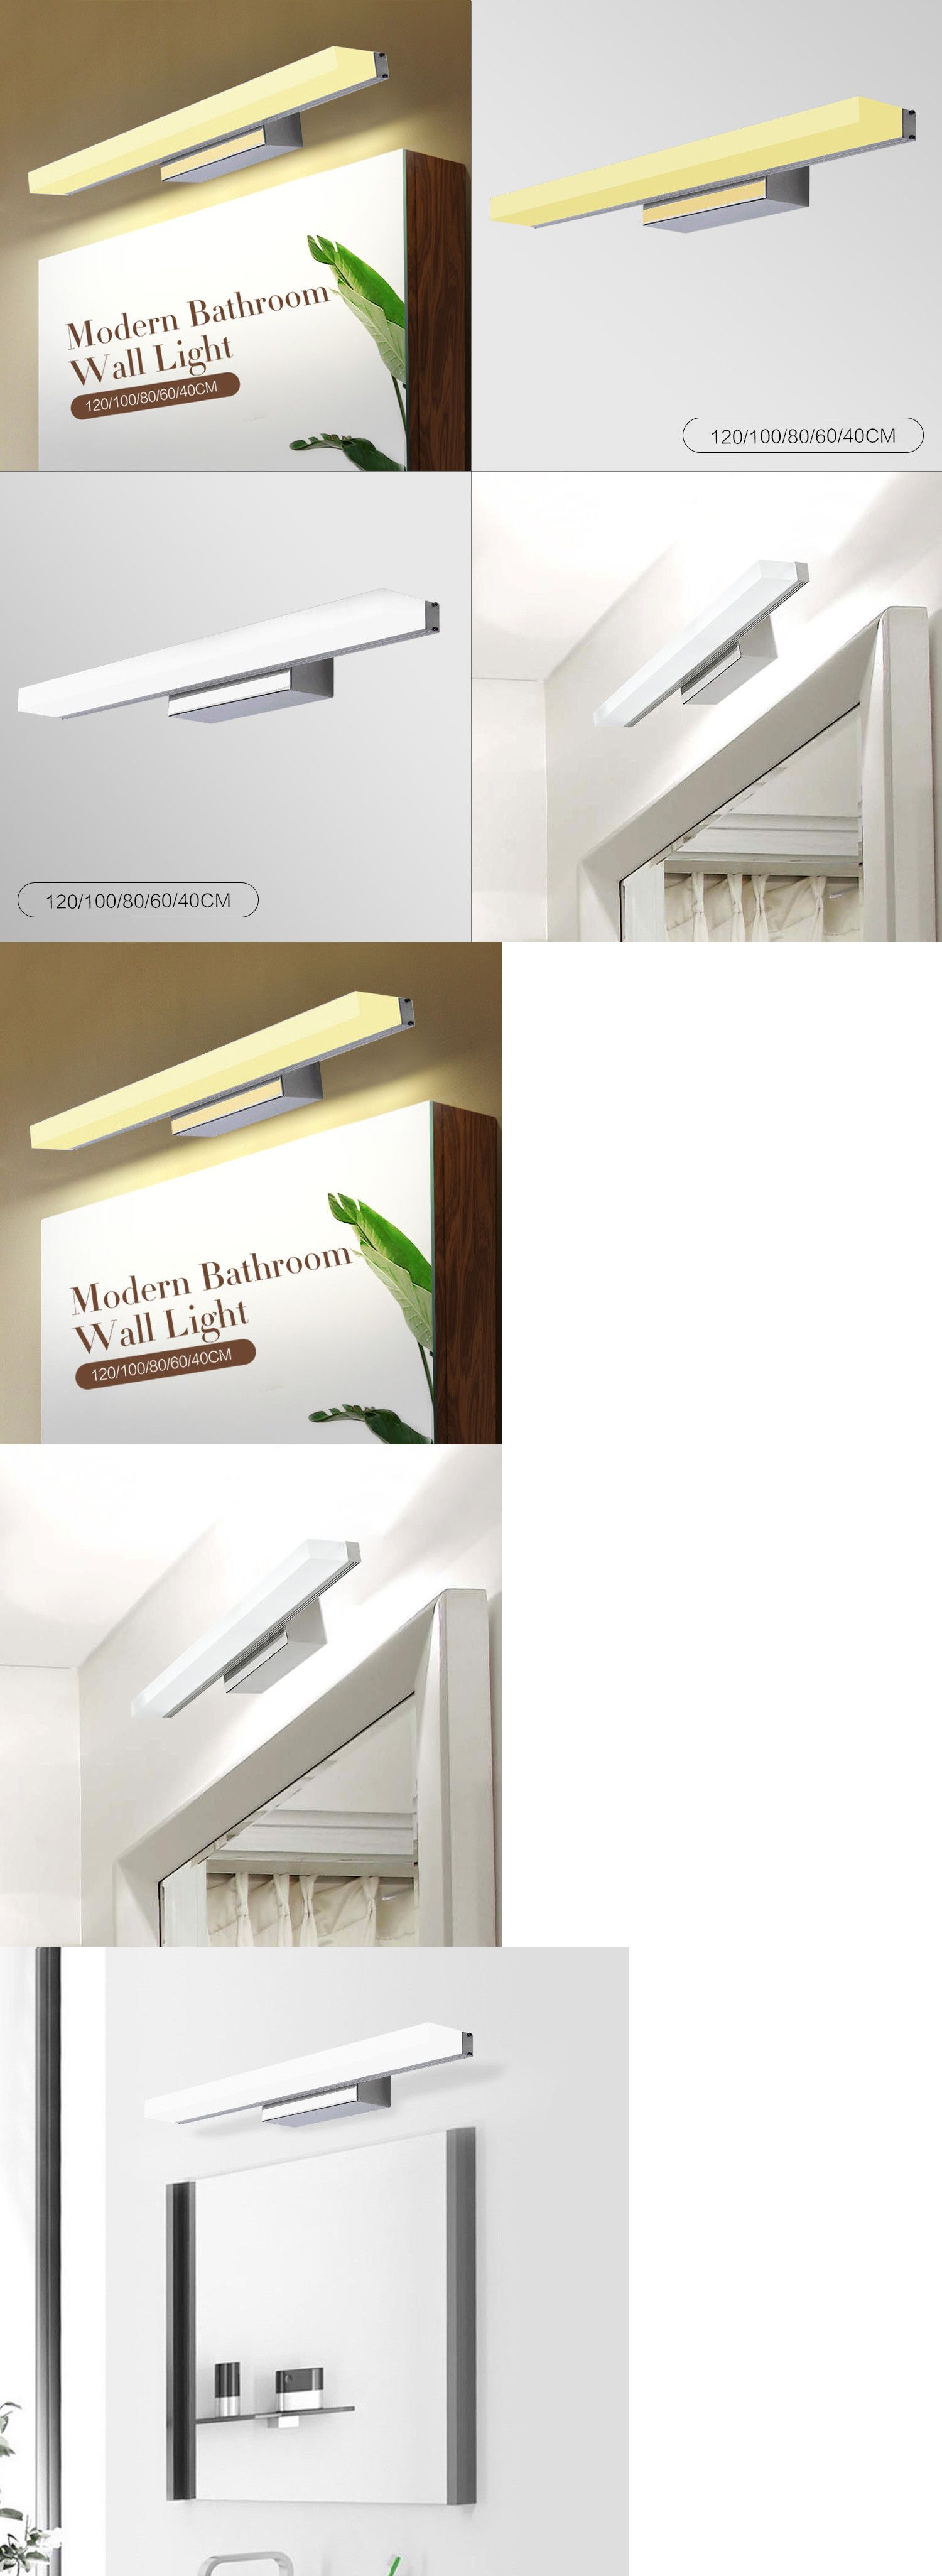 Led wall mount light fixture makeup bathroom vanity toilet home lamp